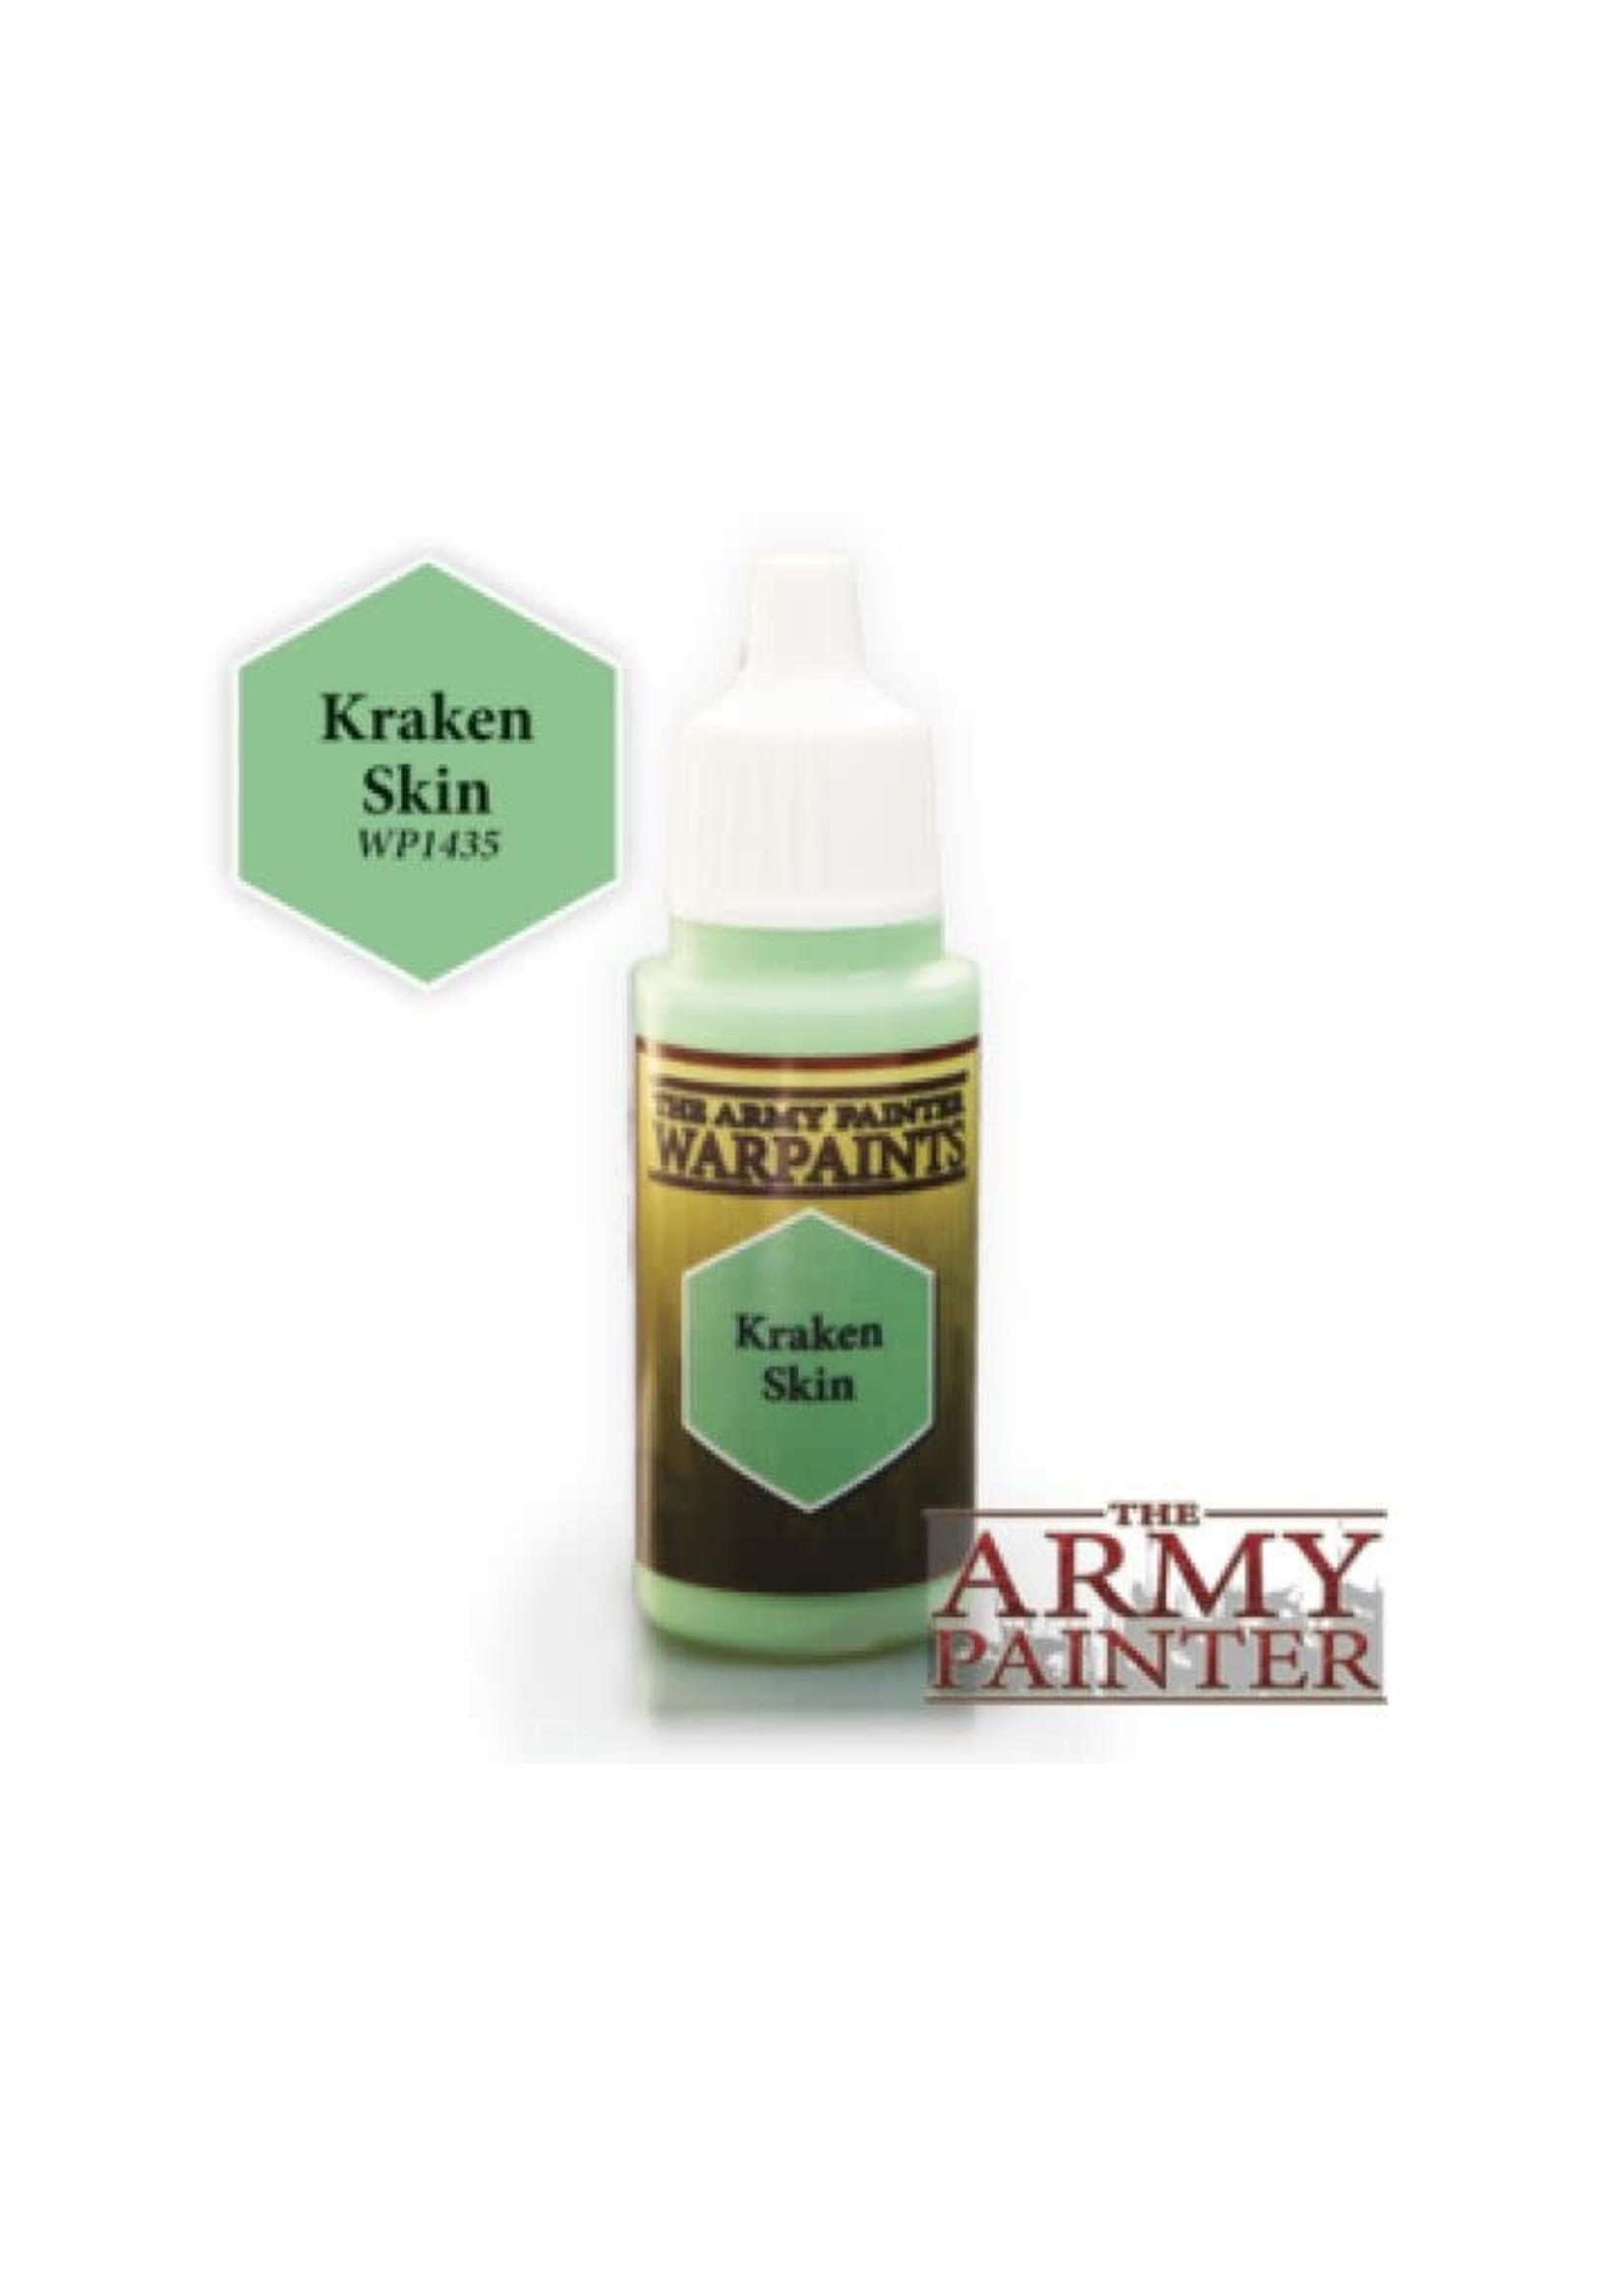 Army Painter Warpaints - Kraken Skin